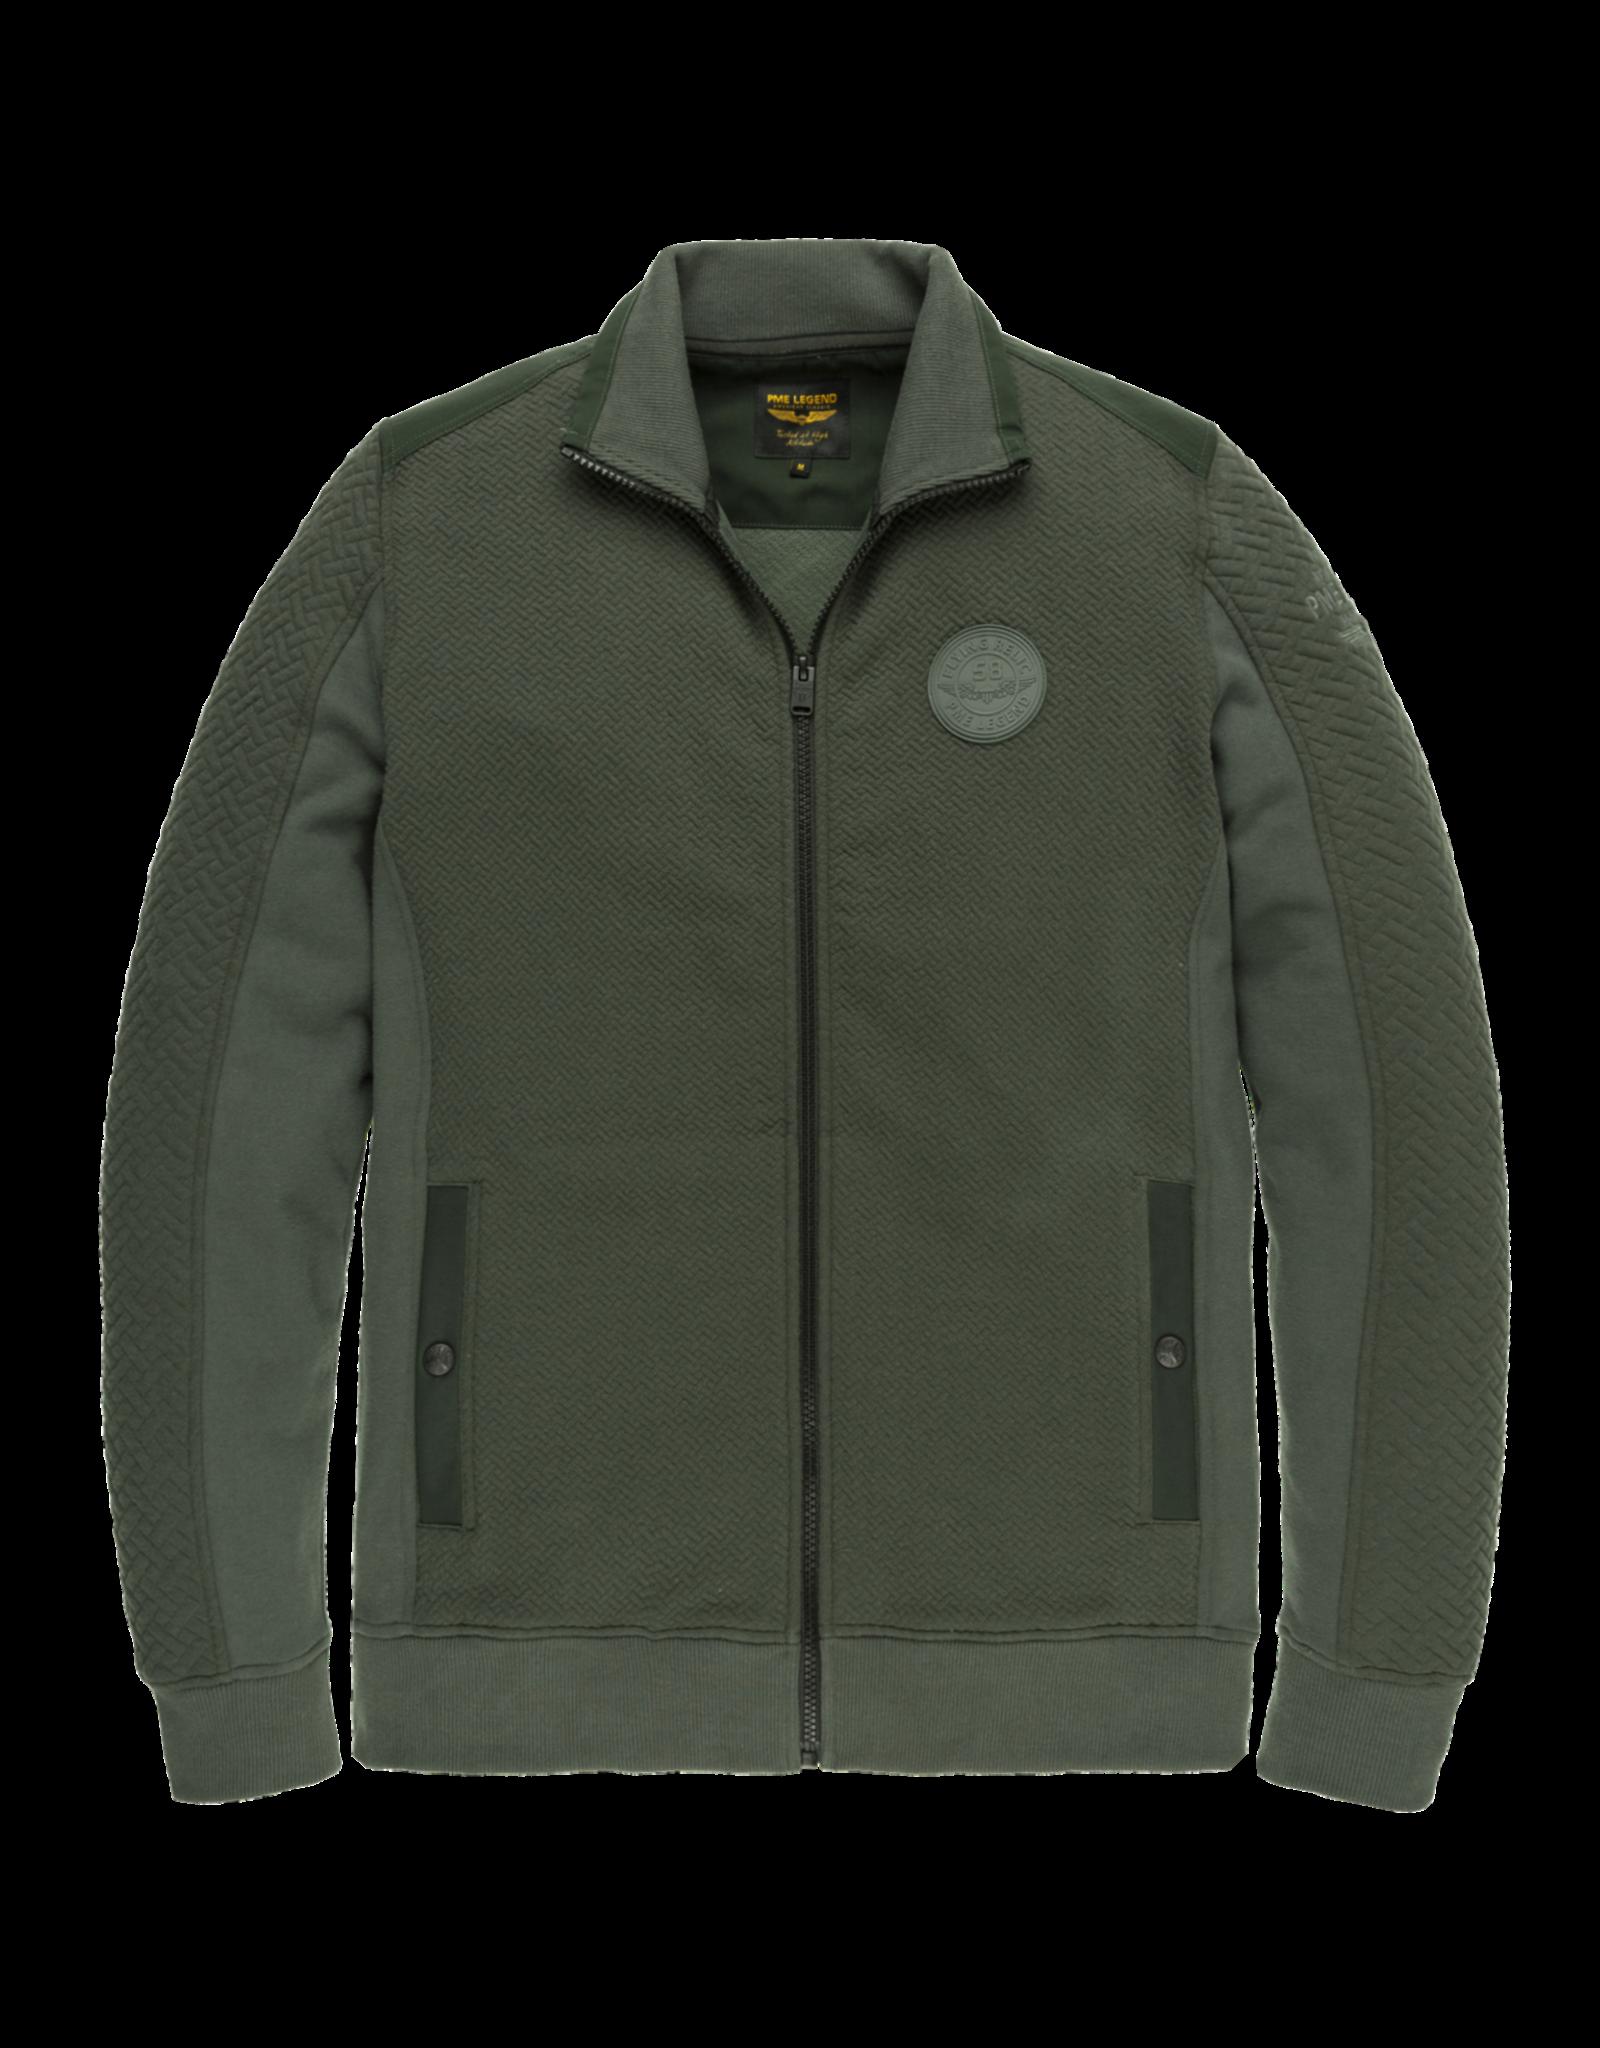 Pme Legend PME Legend zip jacket structure sweat Urban Chic